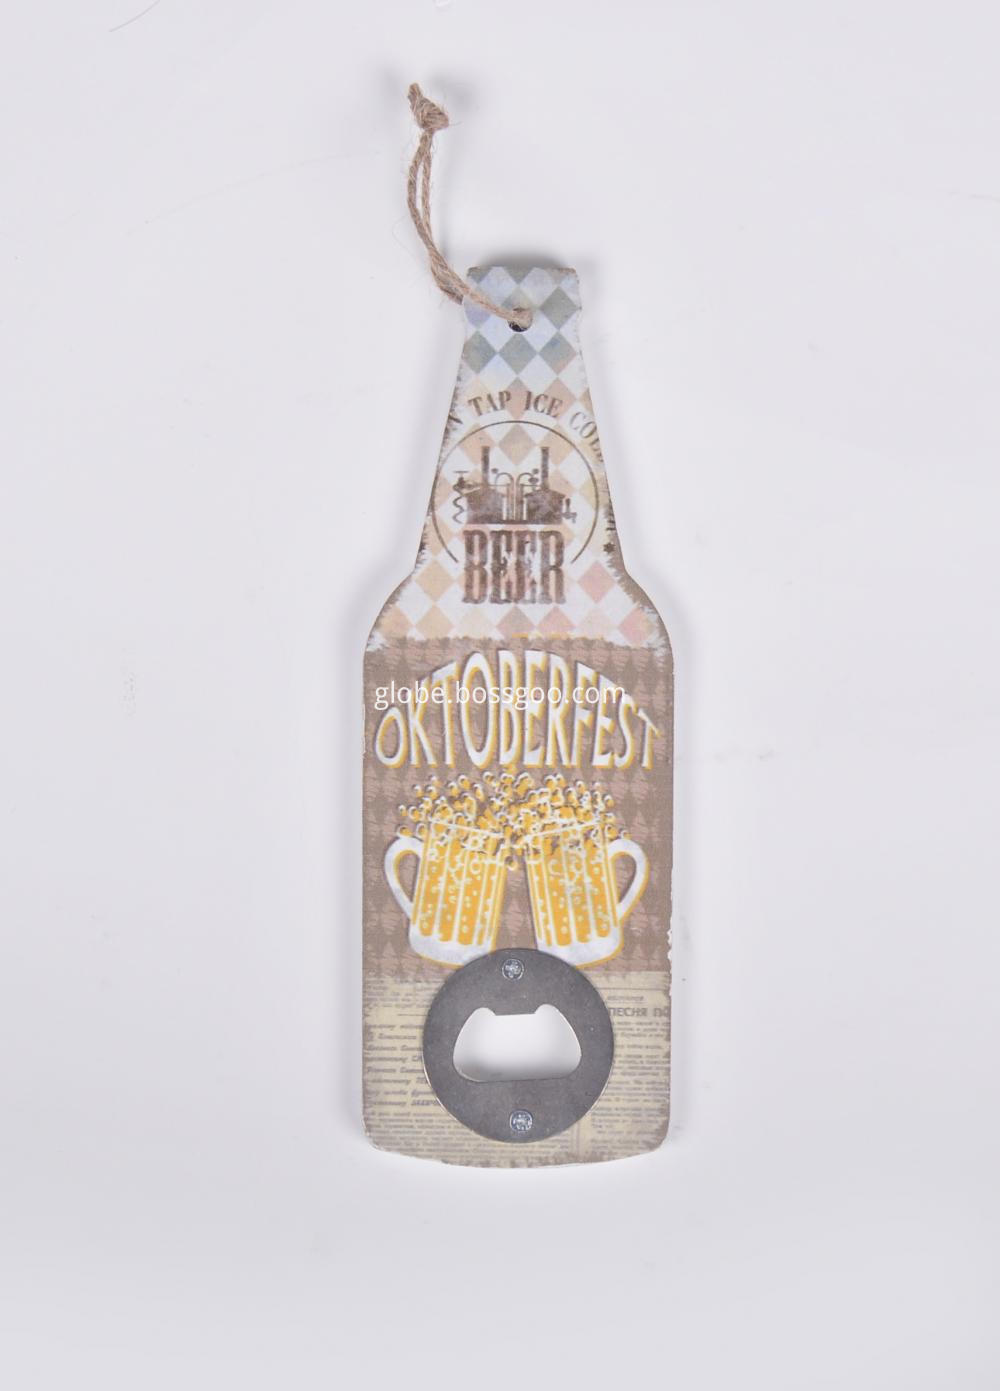 Dsc0372Bottle Opener,Bottle Opener Wooden L,Bottle Opener Wooden L,Stainless Steel Bottle Opener